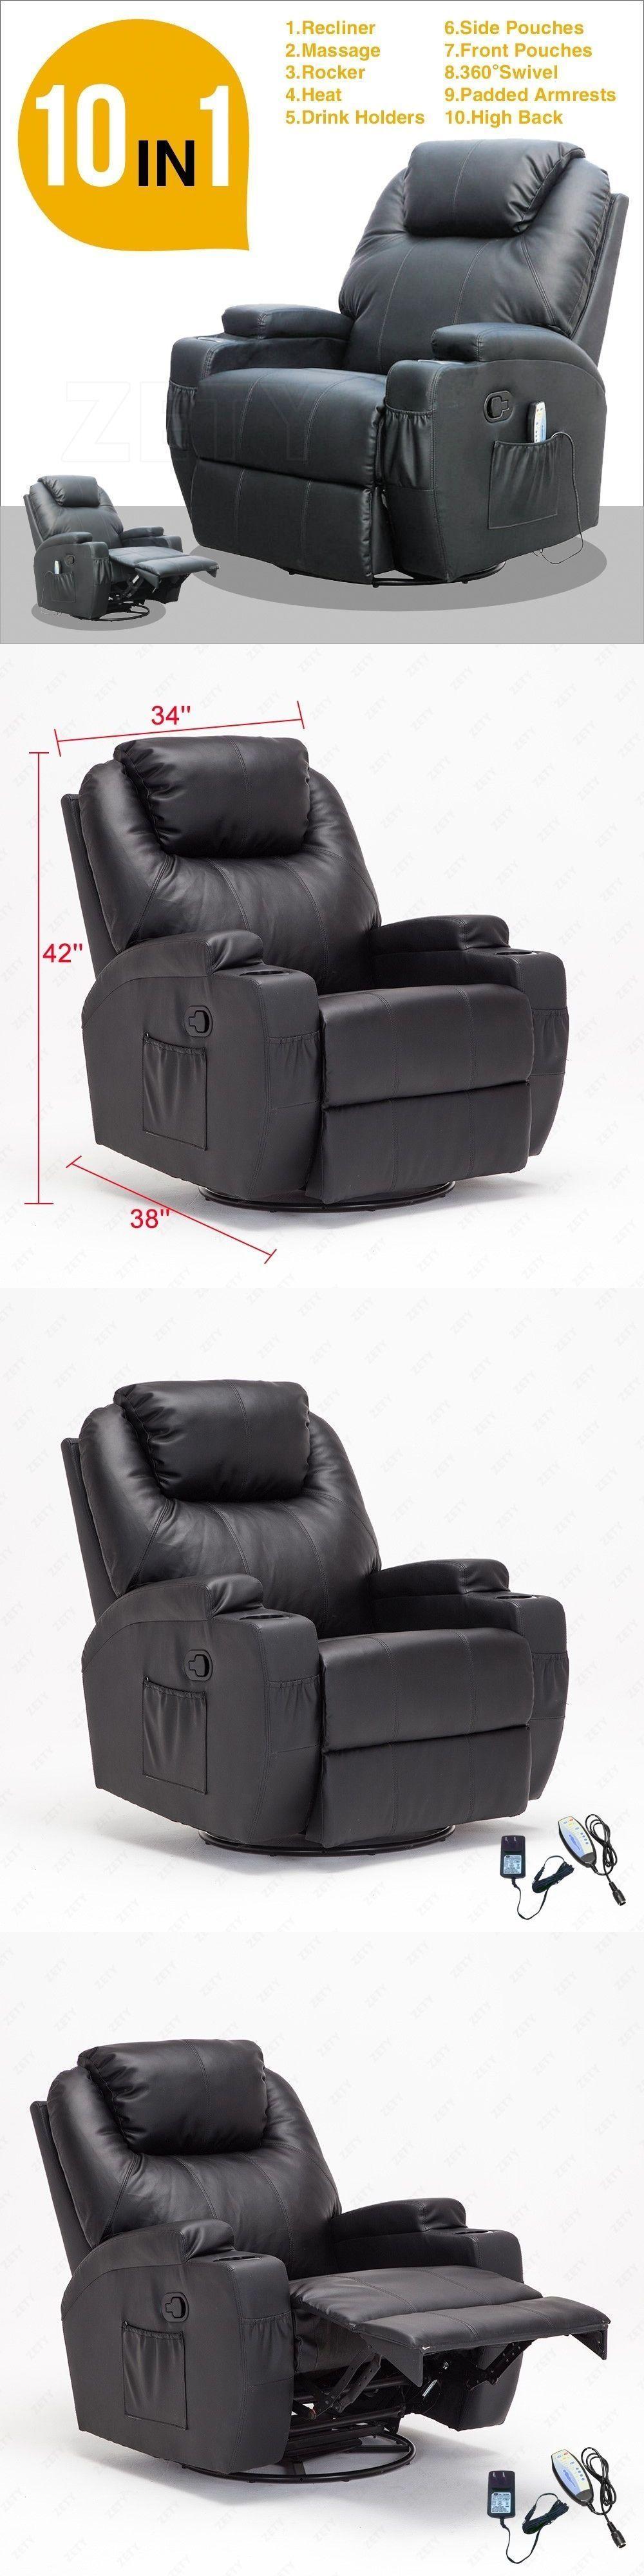 Electric Massage Chairs Massage Recliner Sofa Chair Ergonomic